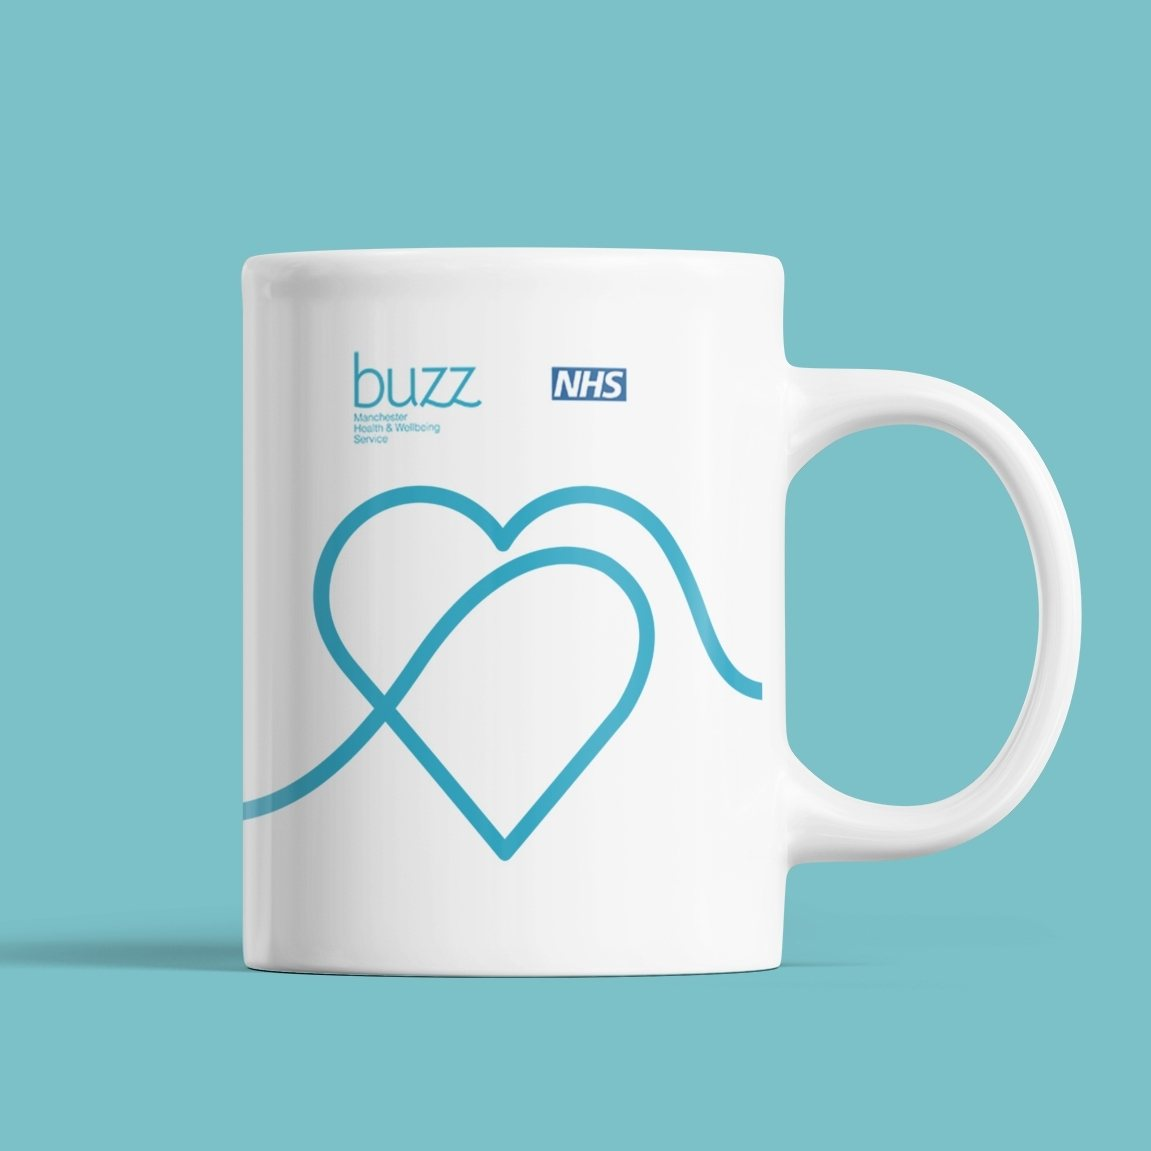 Buzz branding nhs